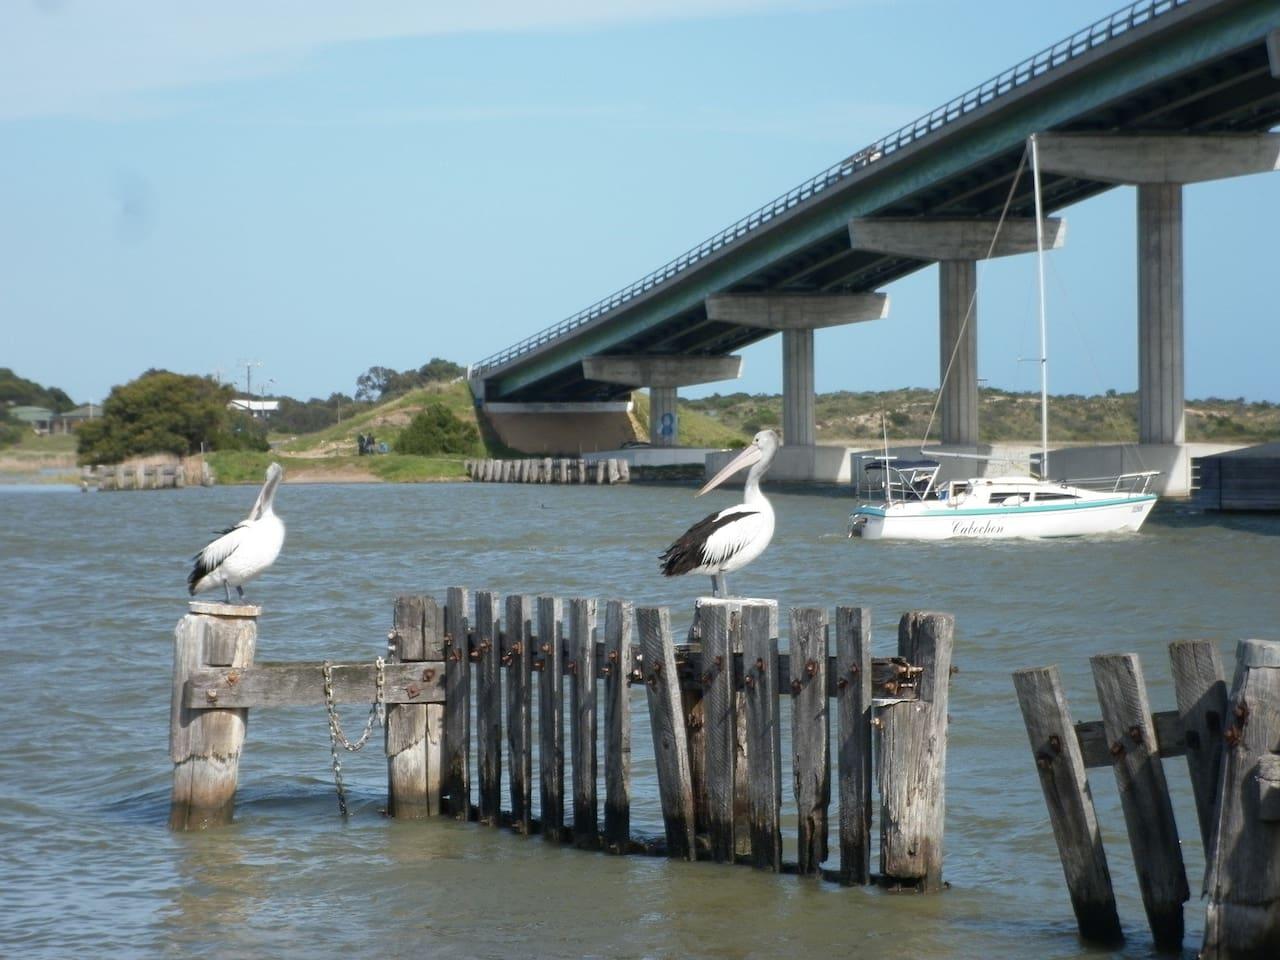 Bridge across The Murray River to the Island